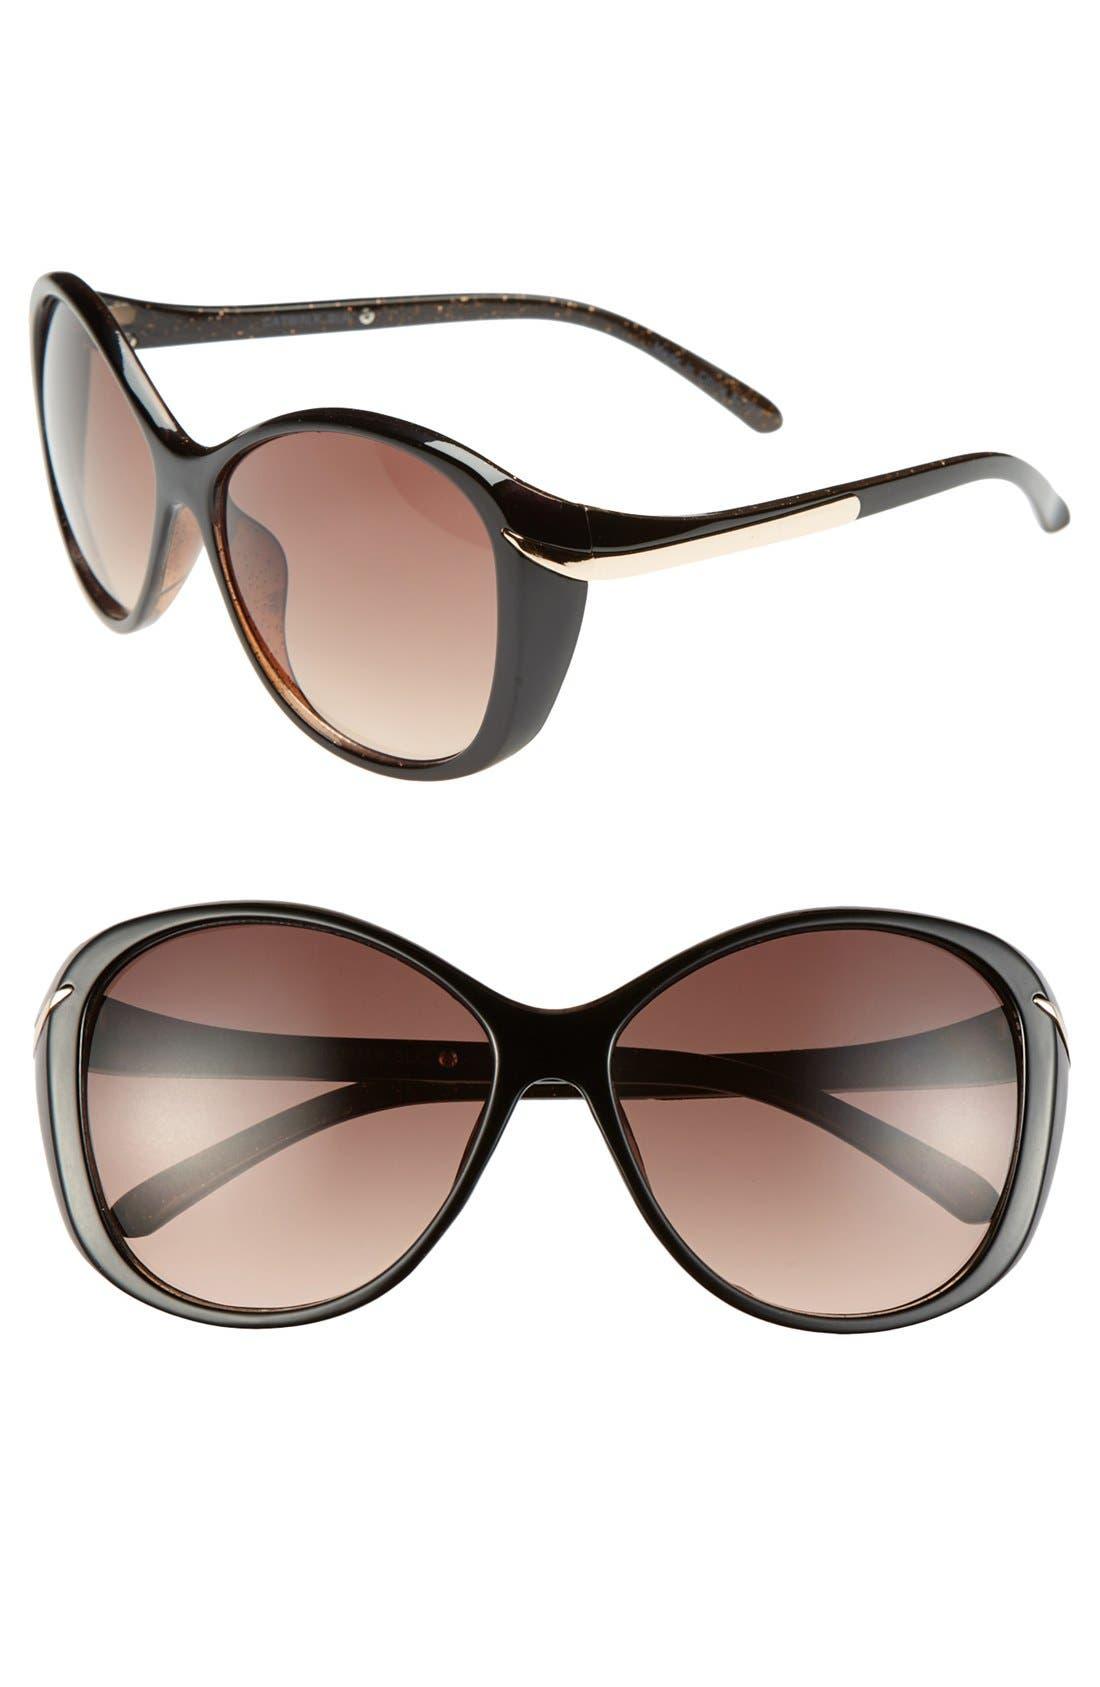 Alternate Image 1 Selected - Outlook Eyewear 'Catwalk' 56mm Sunglasses